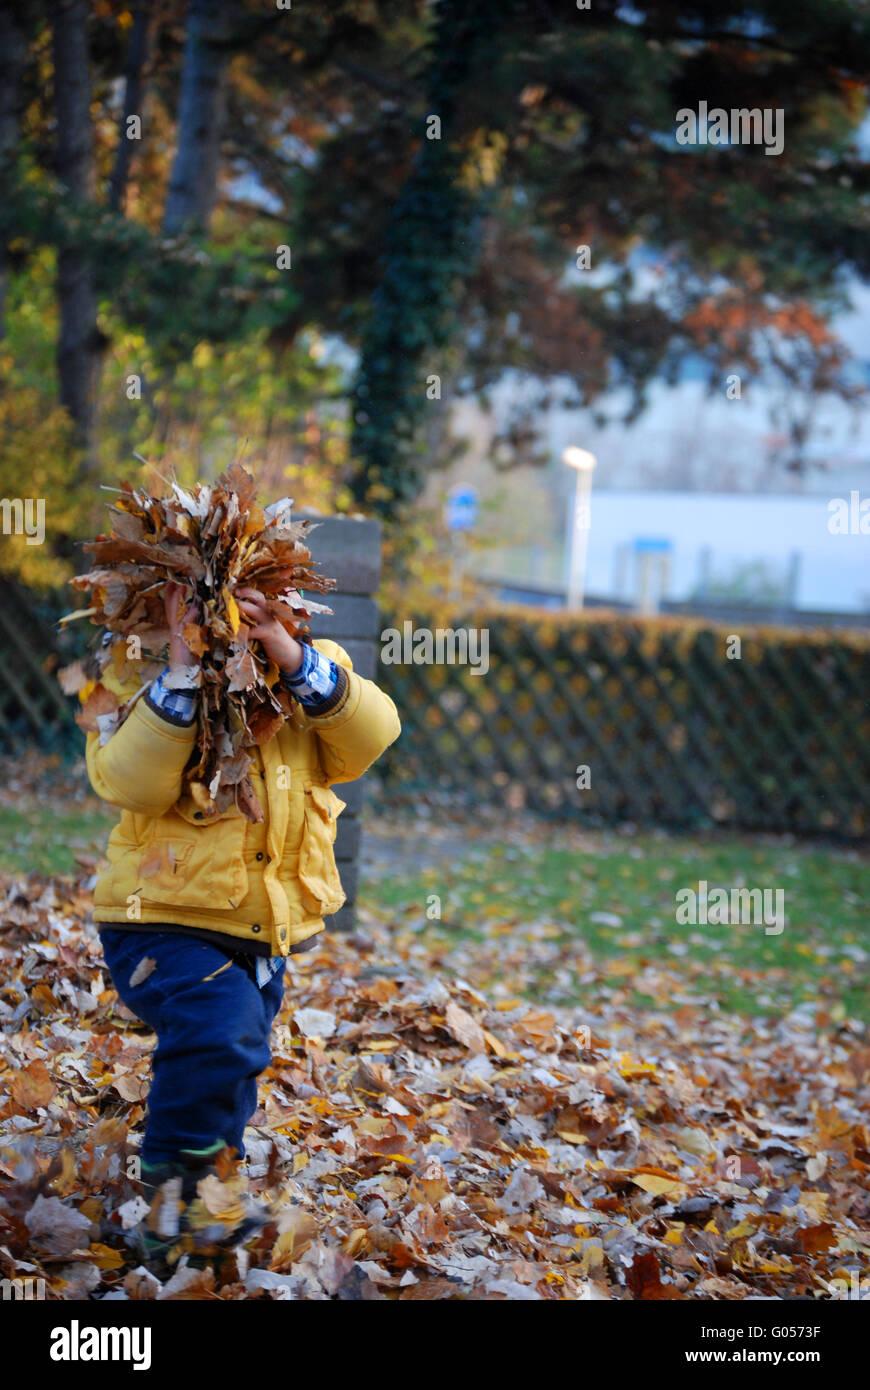 Ein Kind im Herbst Stockbild